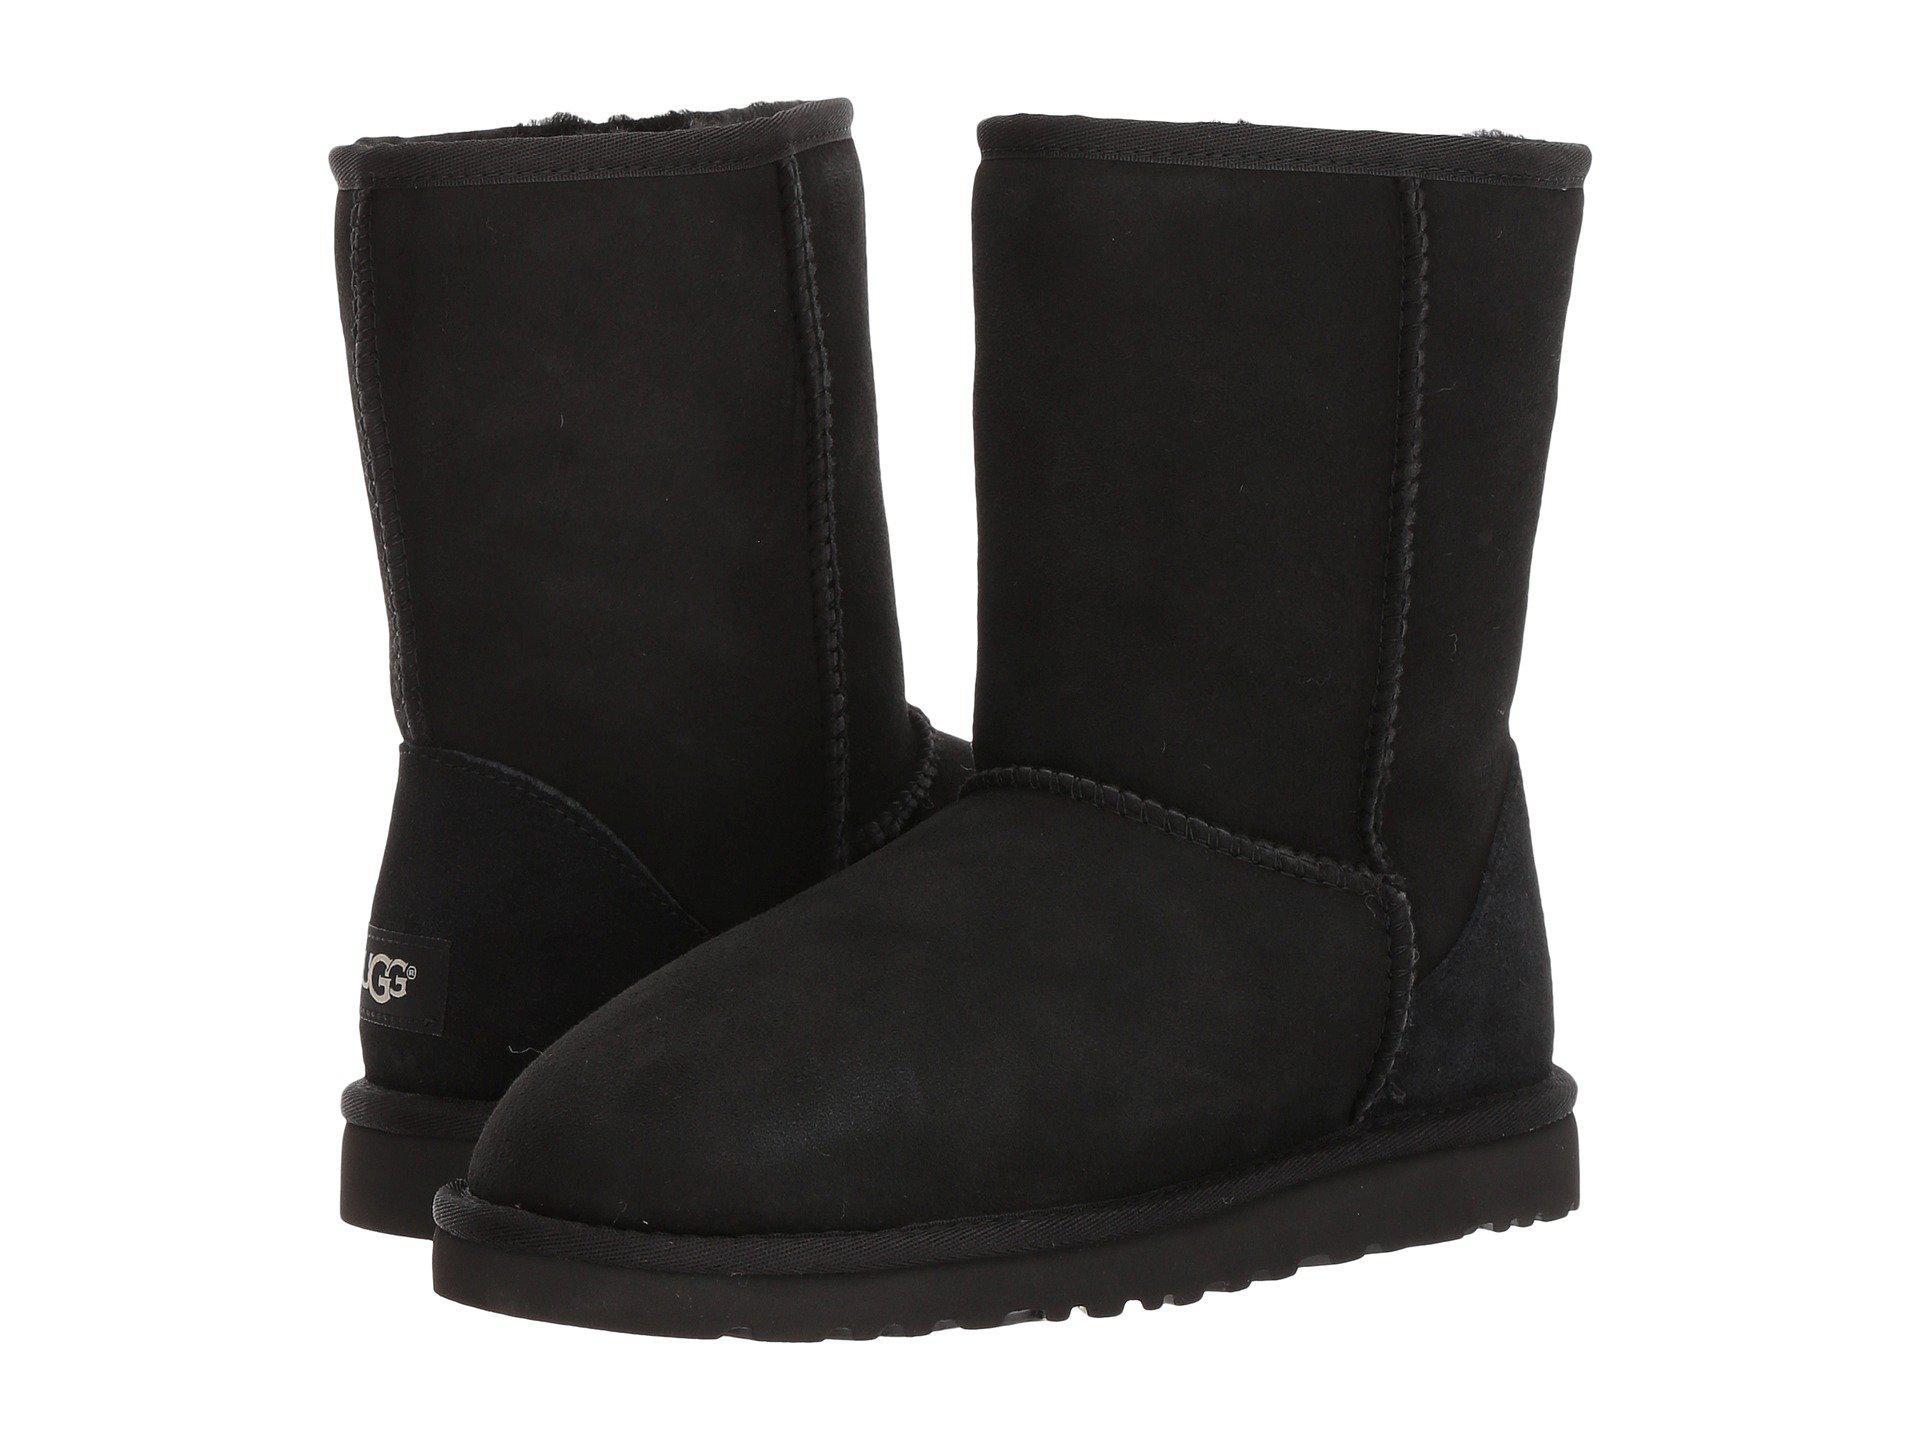 lyst ugg classic short chestnut men s pull on boots in black for men rh lyst com